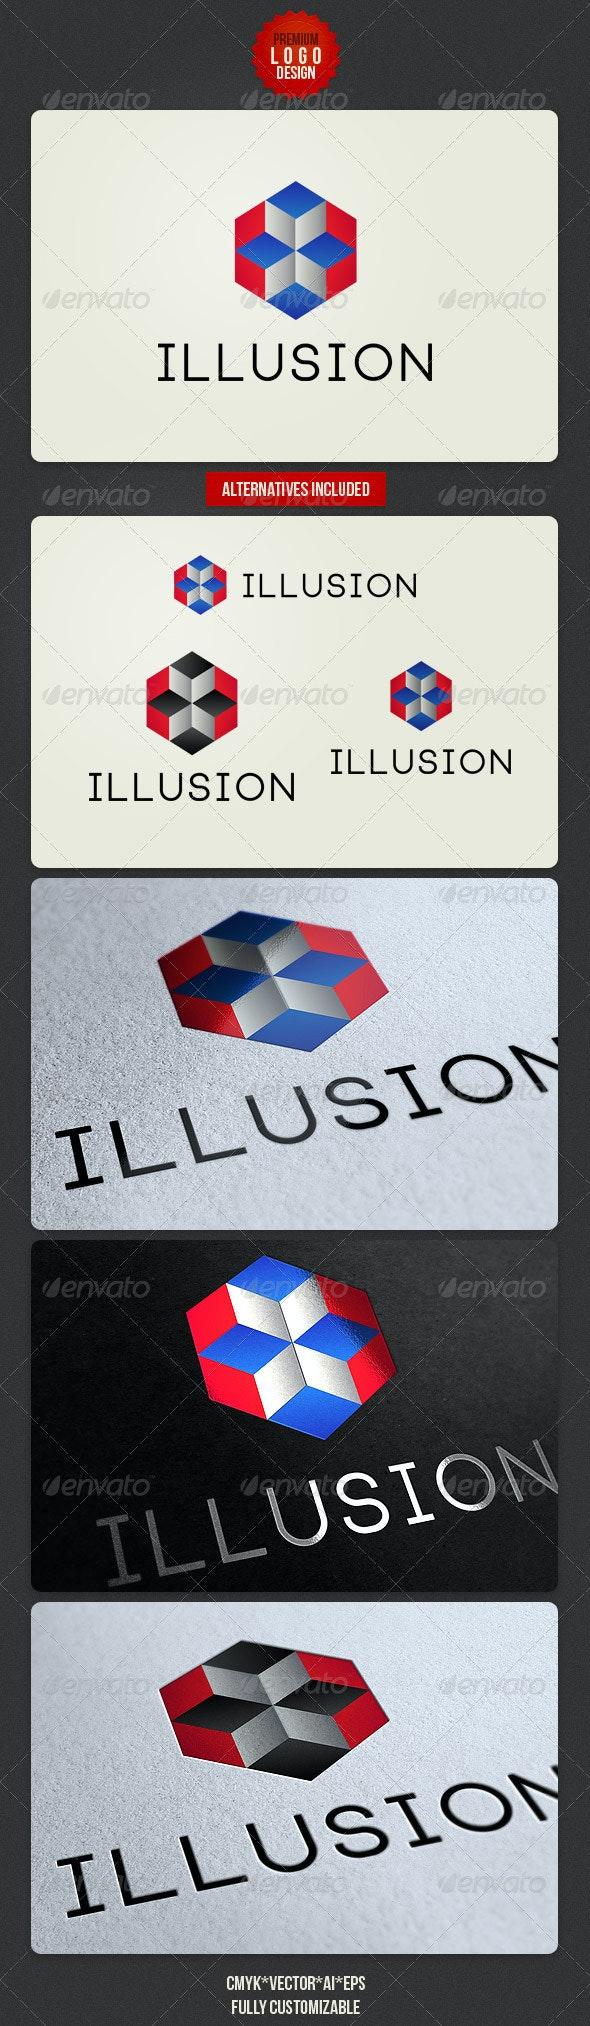 Illusion Geometric Logo Design - Abstract Logo Templates